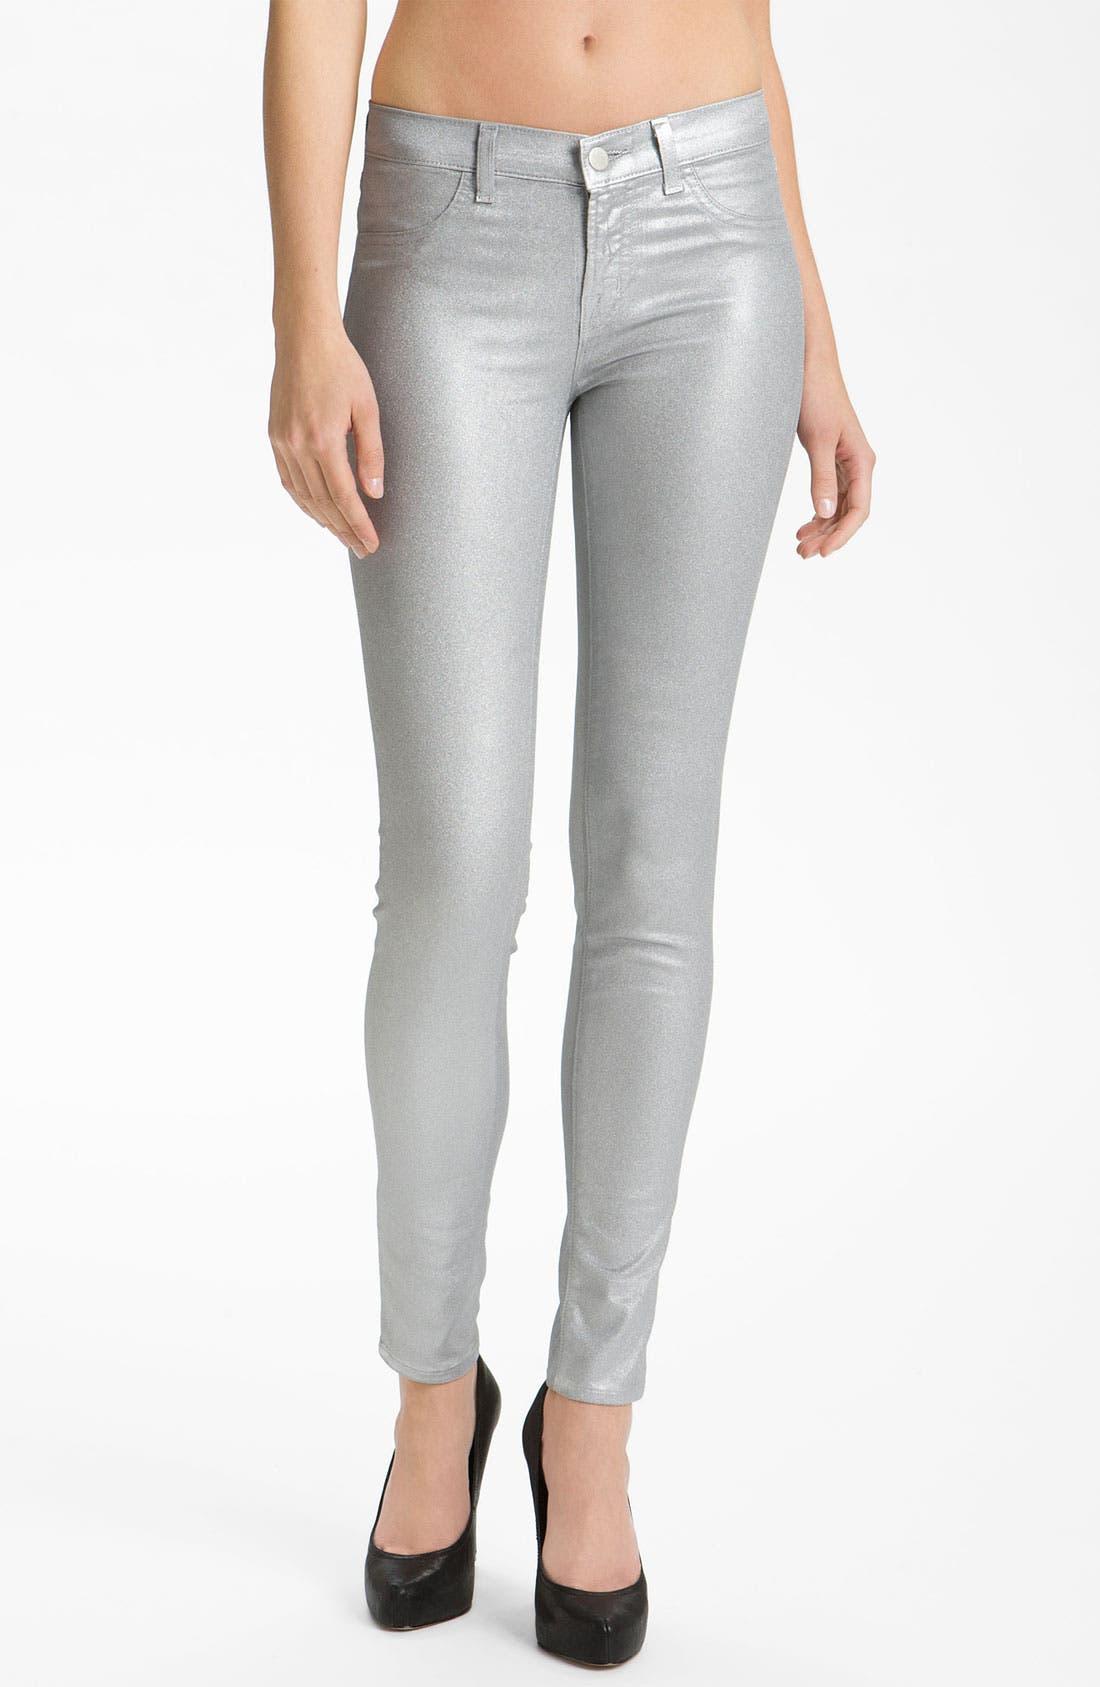 Alternate Image 1 Selected - J Brand Stretch Denim Leggings (Coated Silver Sparkle)